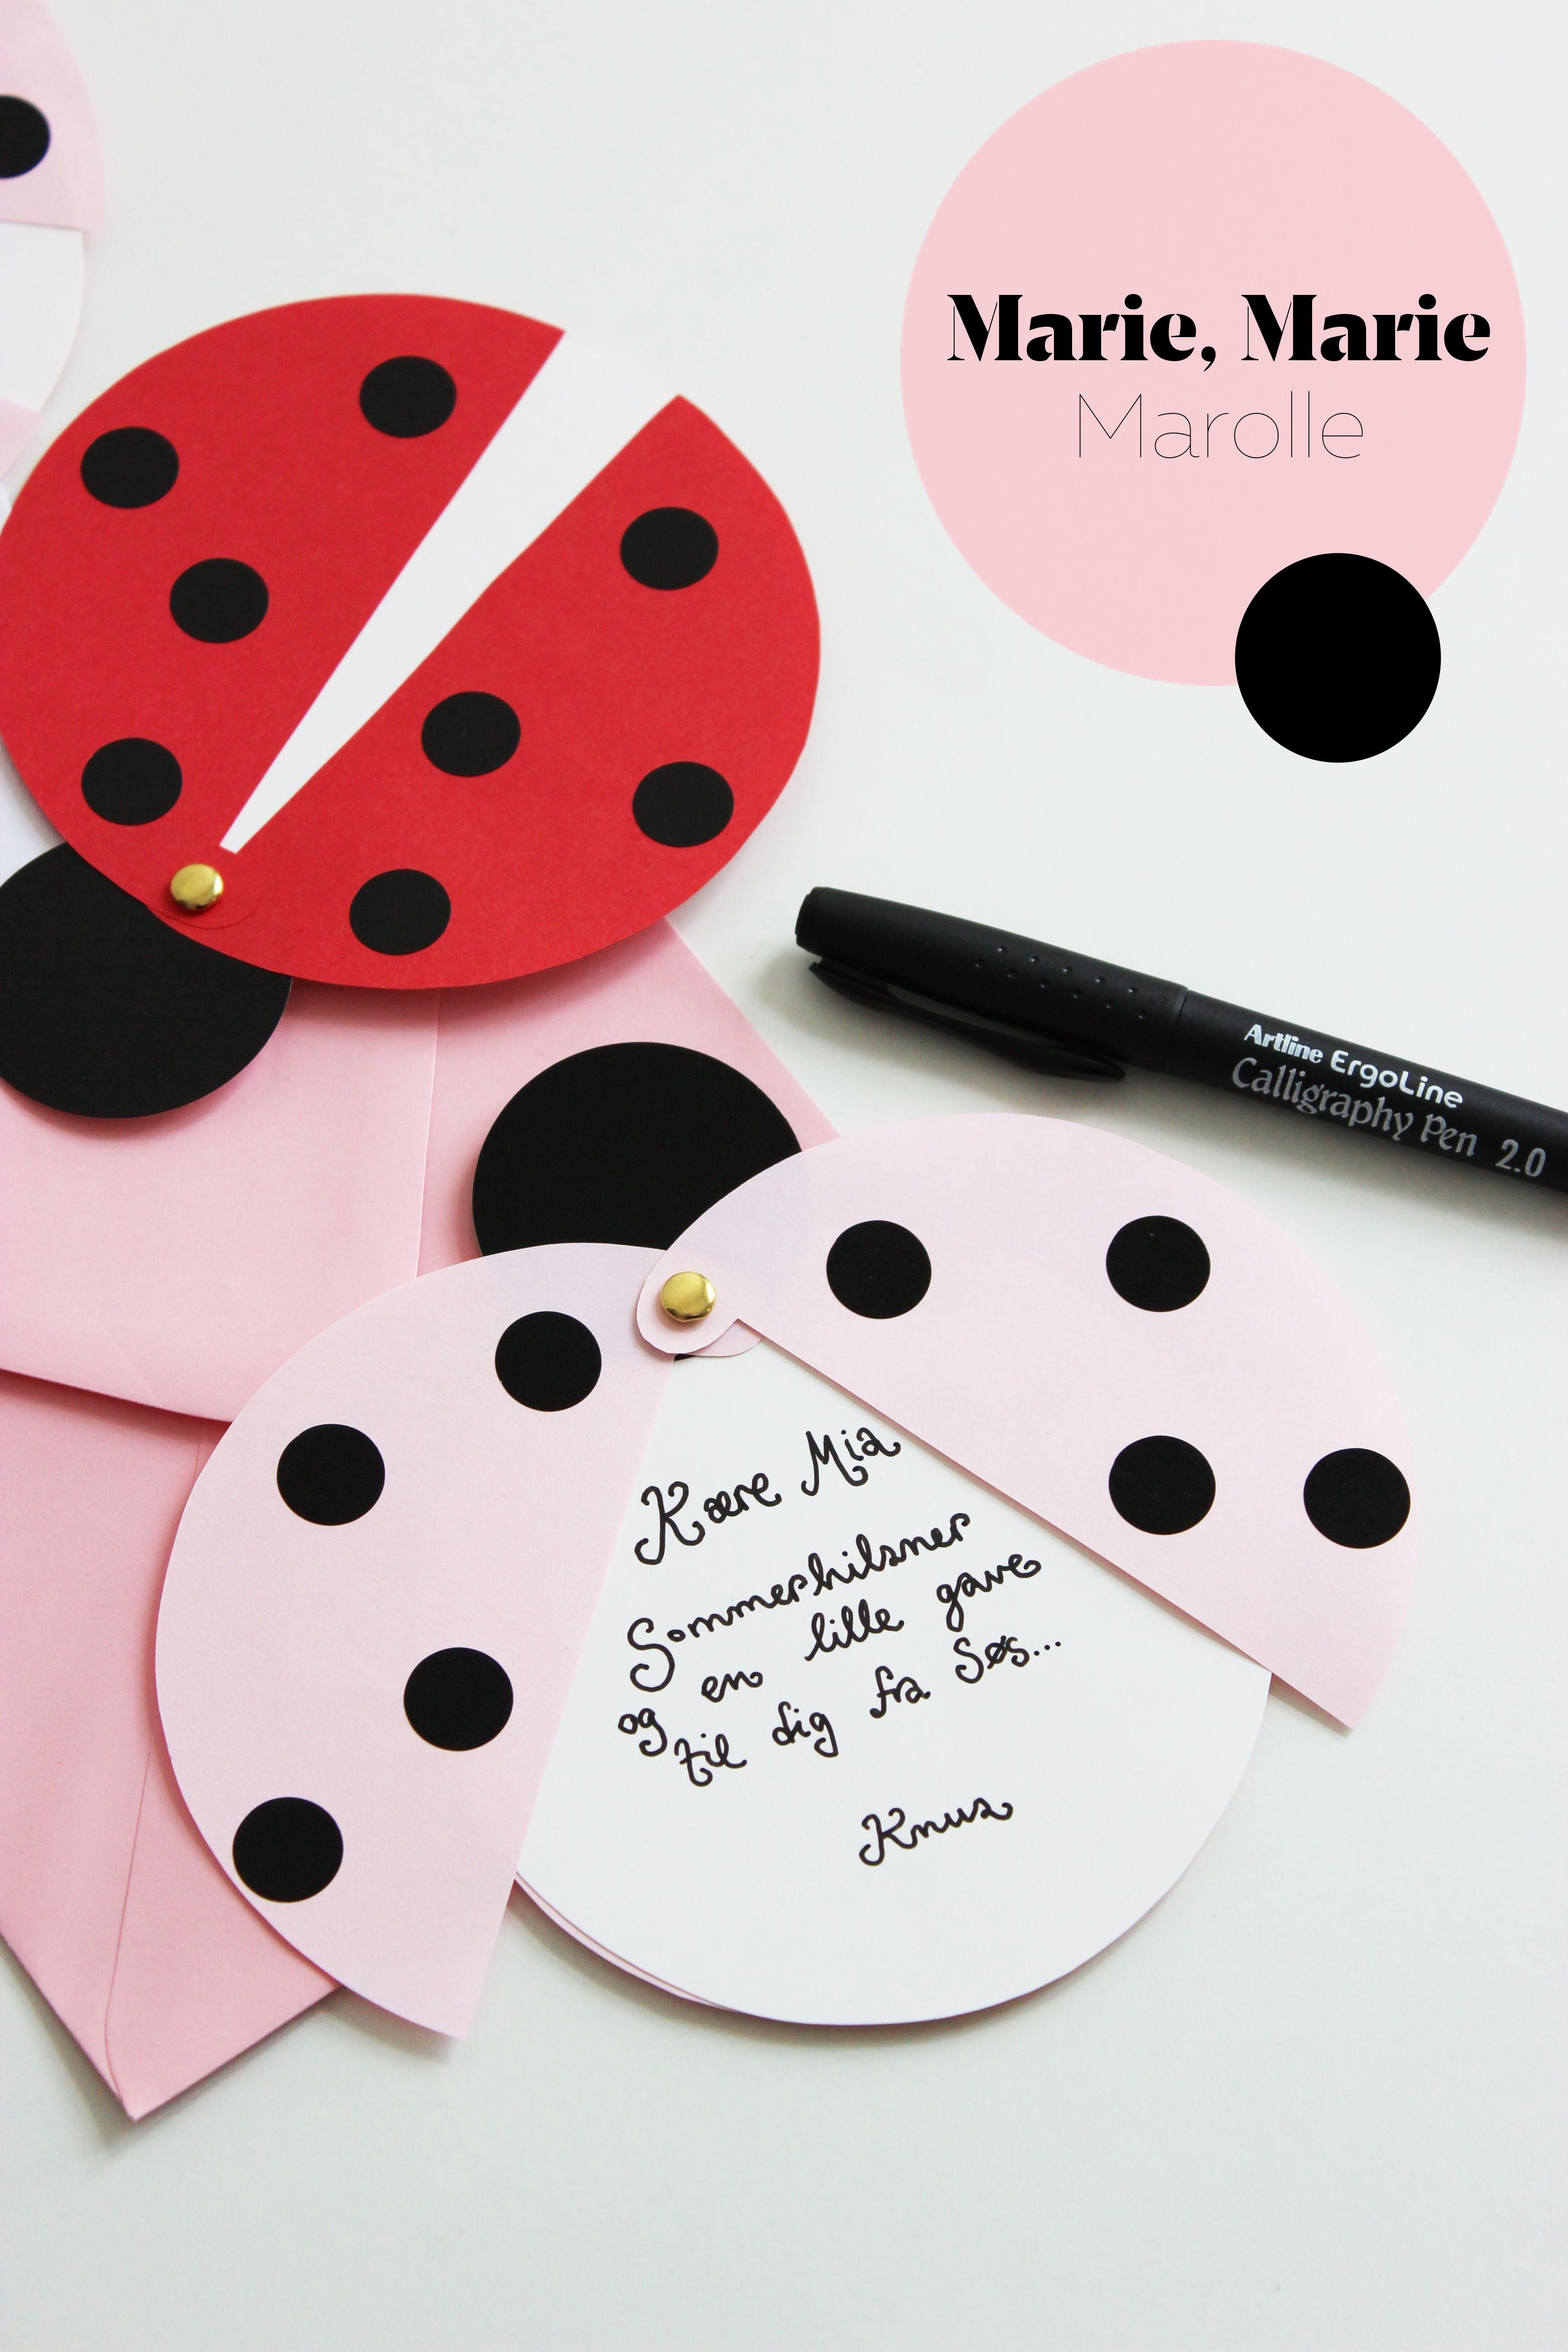 Diy: Ladybug Party Invitations (Free Printable Template)   Diy - Free Printable Ladybug Invitations